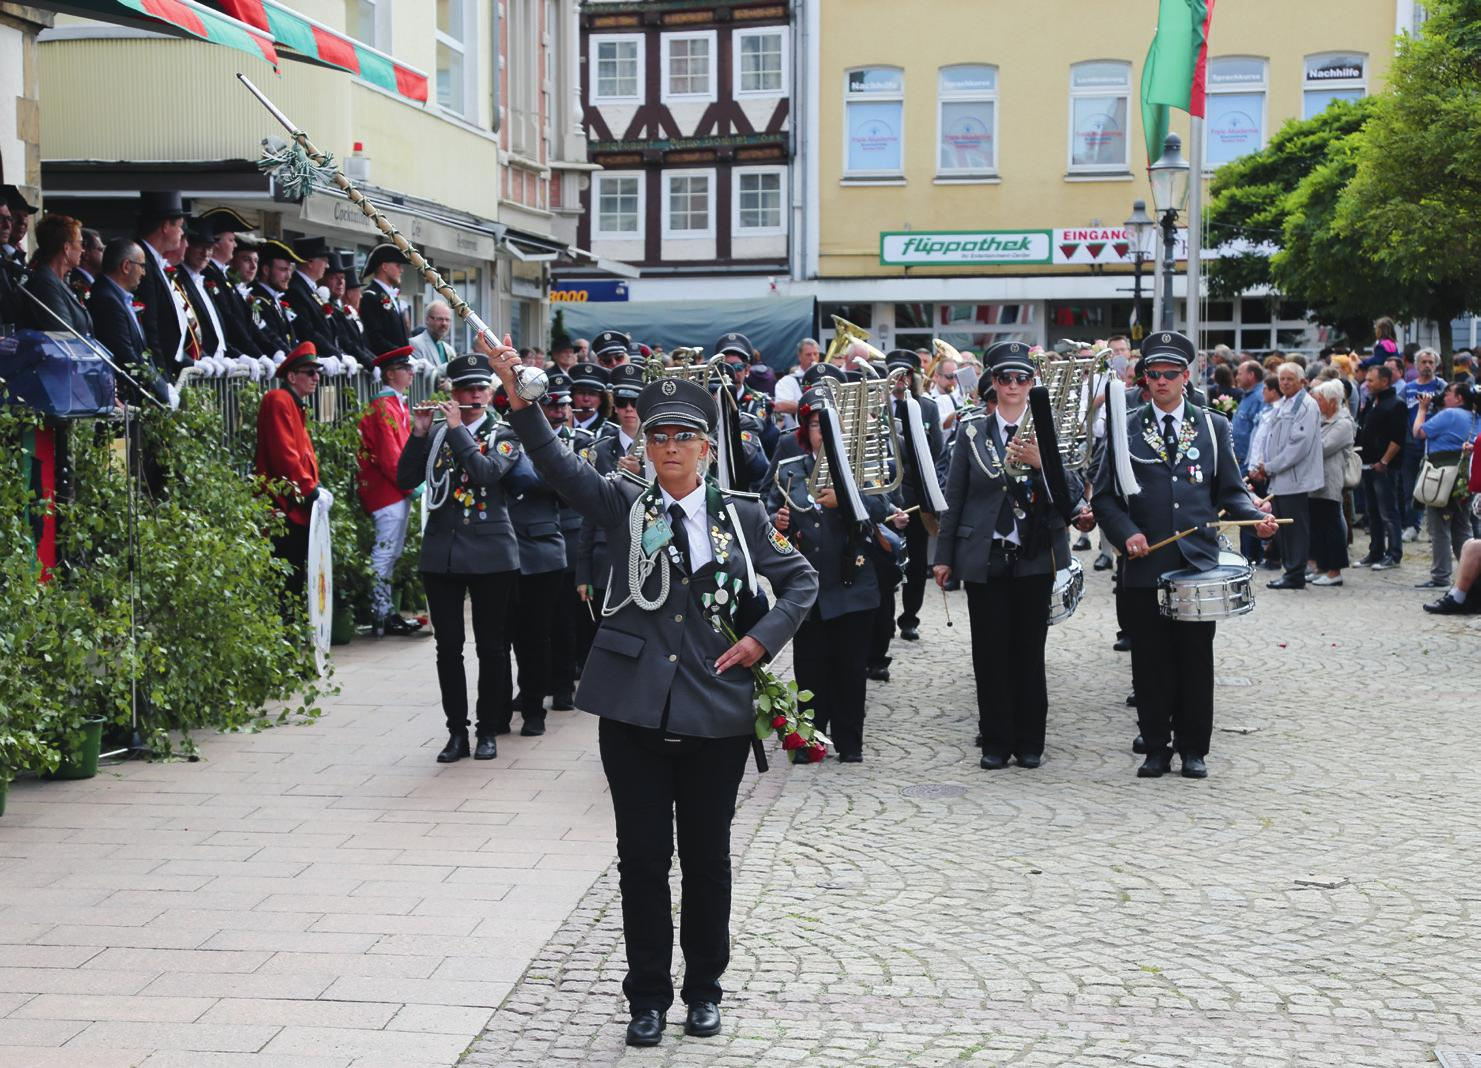 Freischiessen Fotoheft - Juli 2019 - I. Image 2